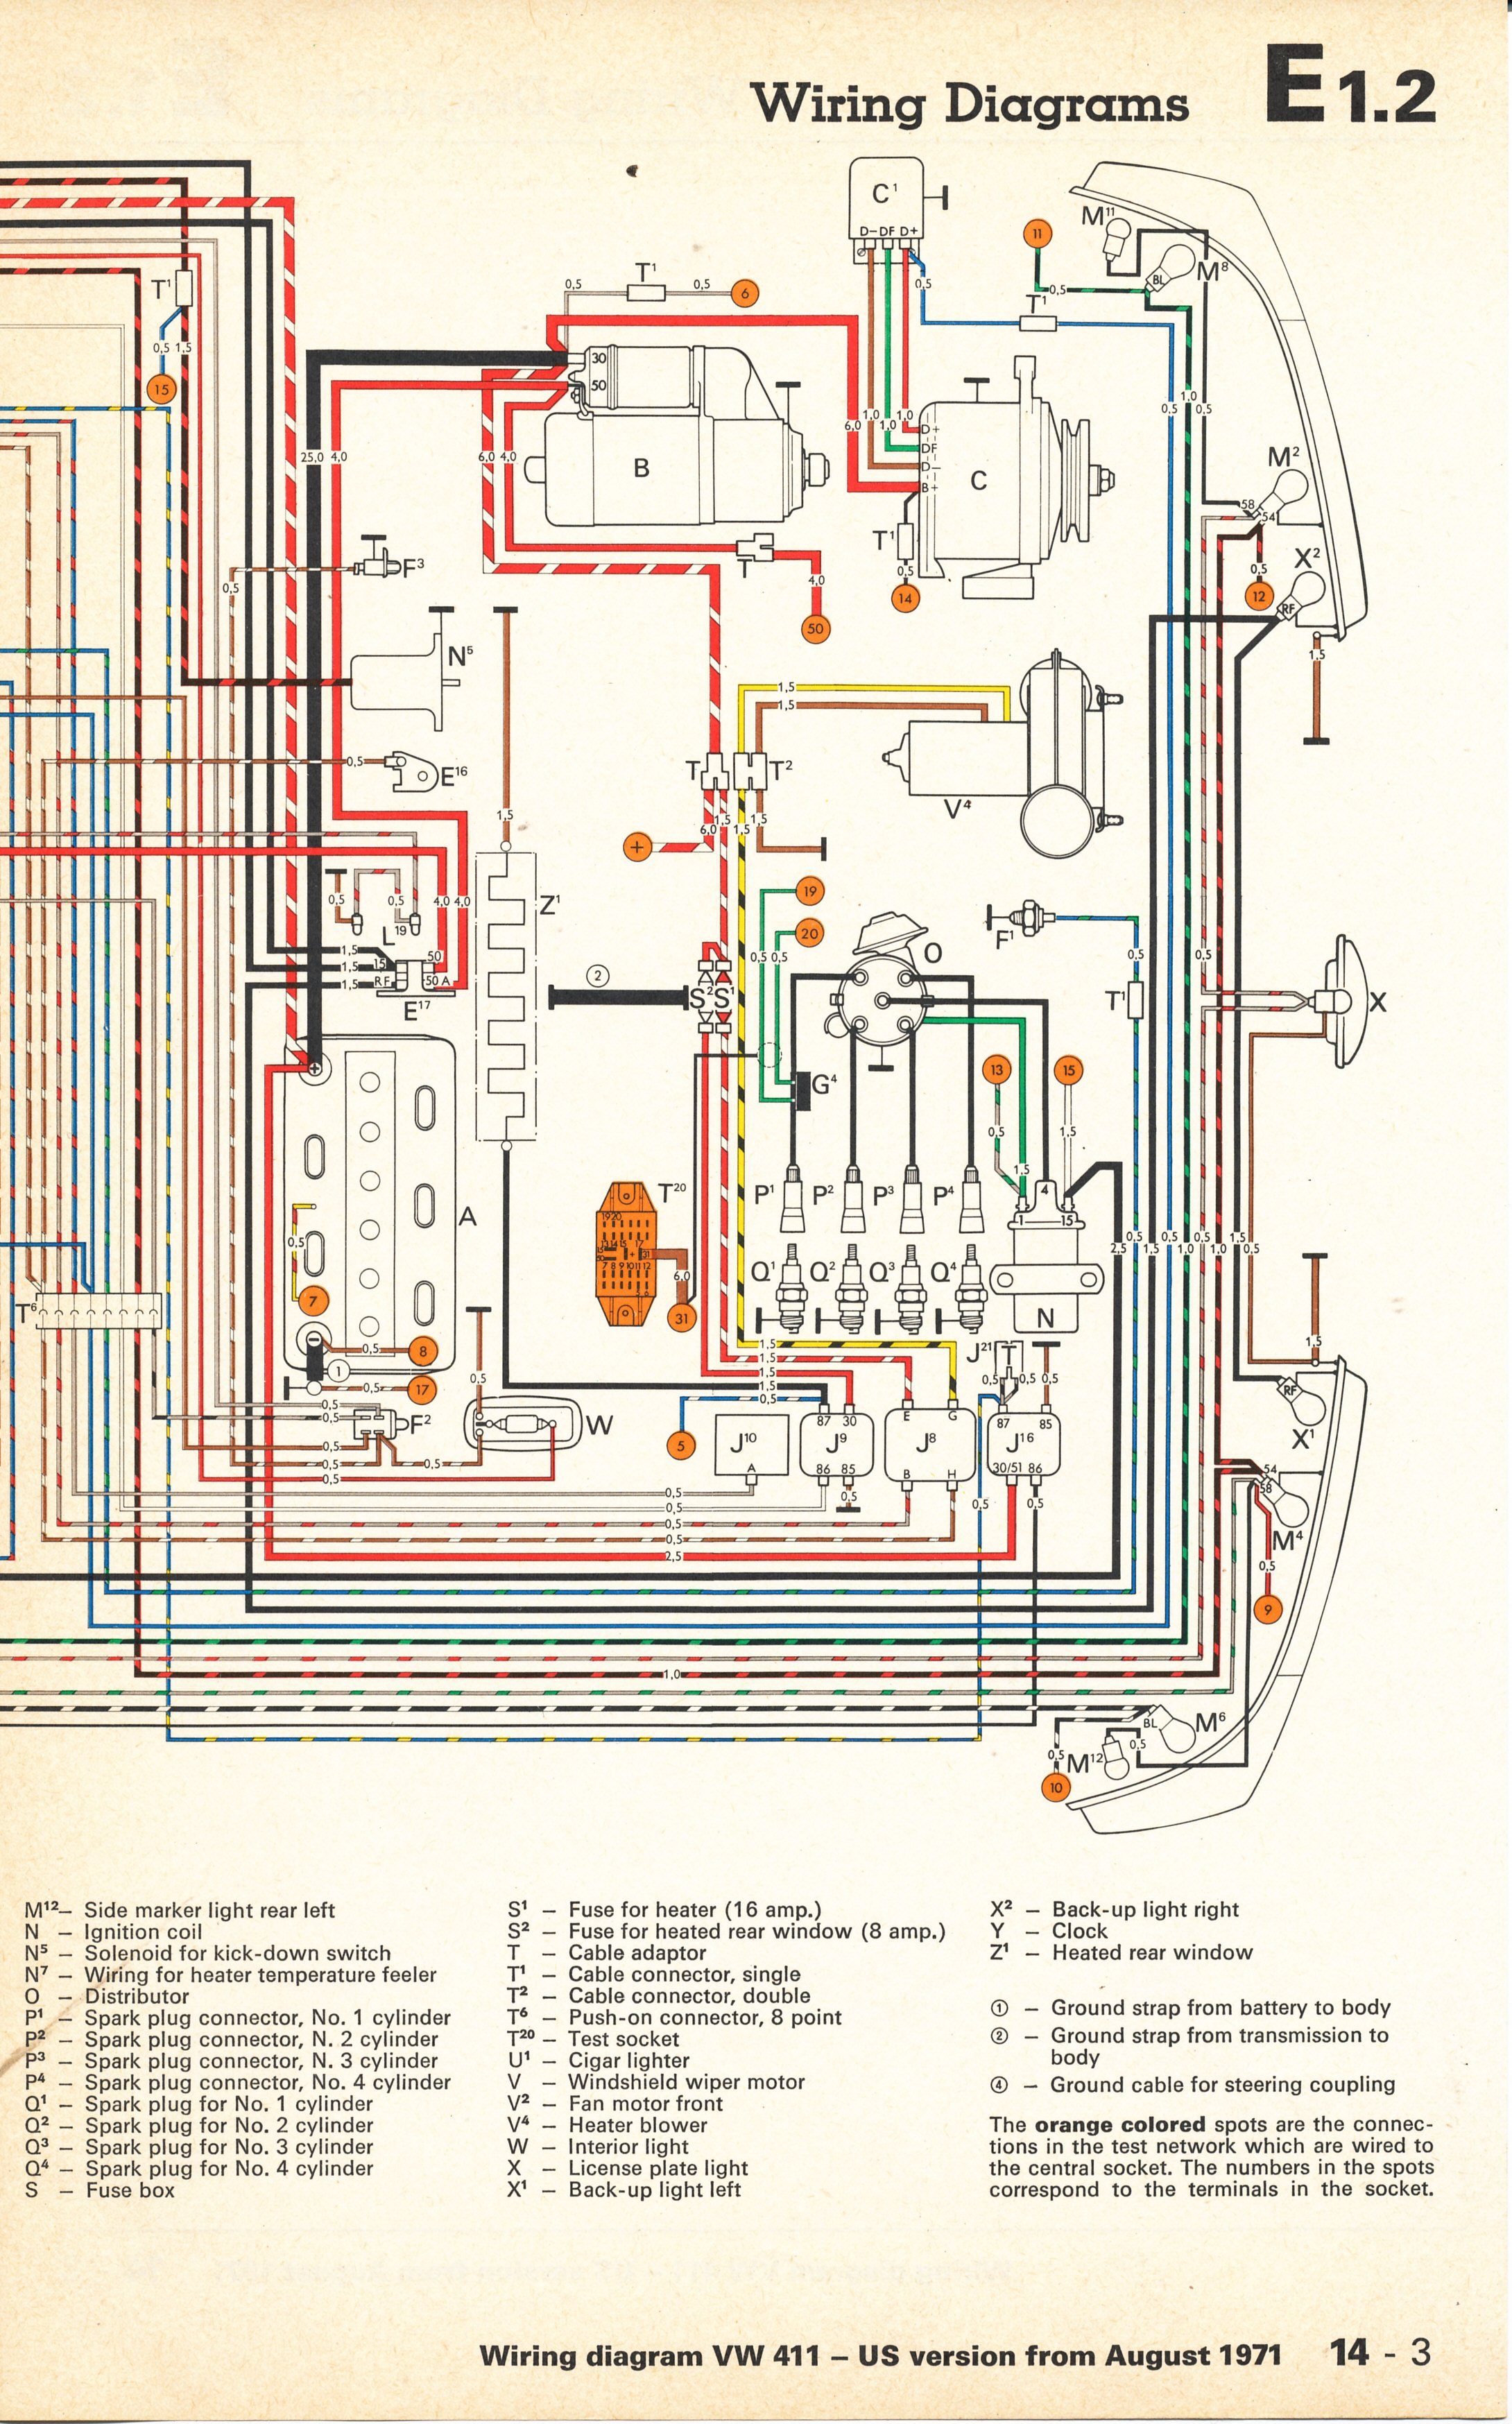 411_1972b_usversion?resize\\\\\\\\\\\\\\\\\\\\\\\\\\\\\\\=665%2C1066 2002 impala wiring diagram 2002 chevy impala bcm diagram \u2022 free 1964 impala wiring diagram at webbmarketing.co